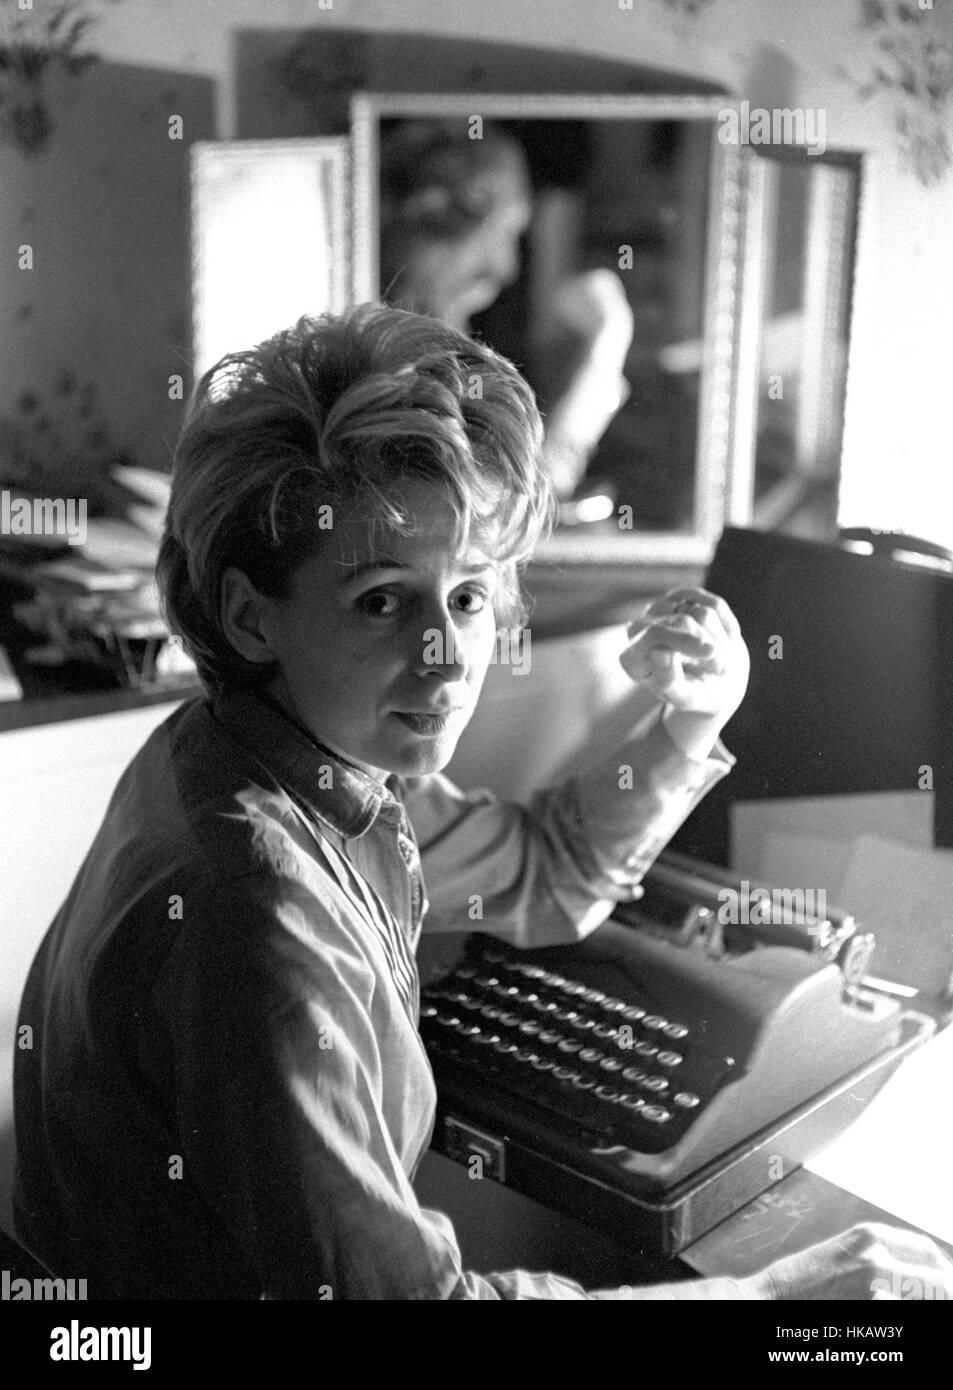 Caroline Benn (Caroline Middleton DeCamp), wife of Tony Benn, shown here at home with a portable typewriter serving - Stock Image